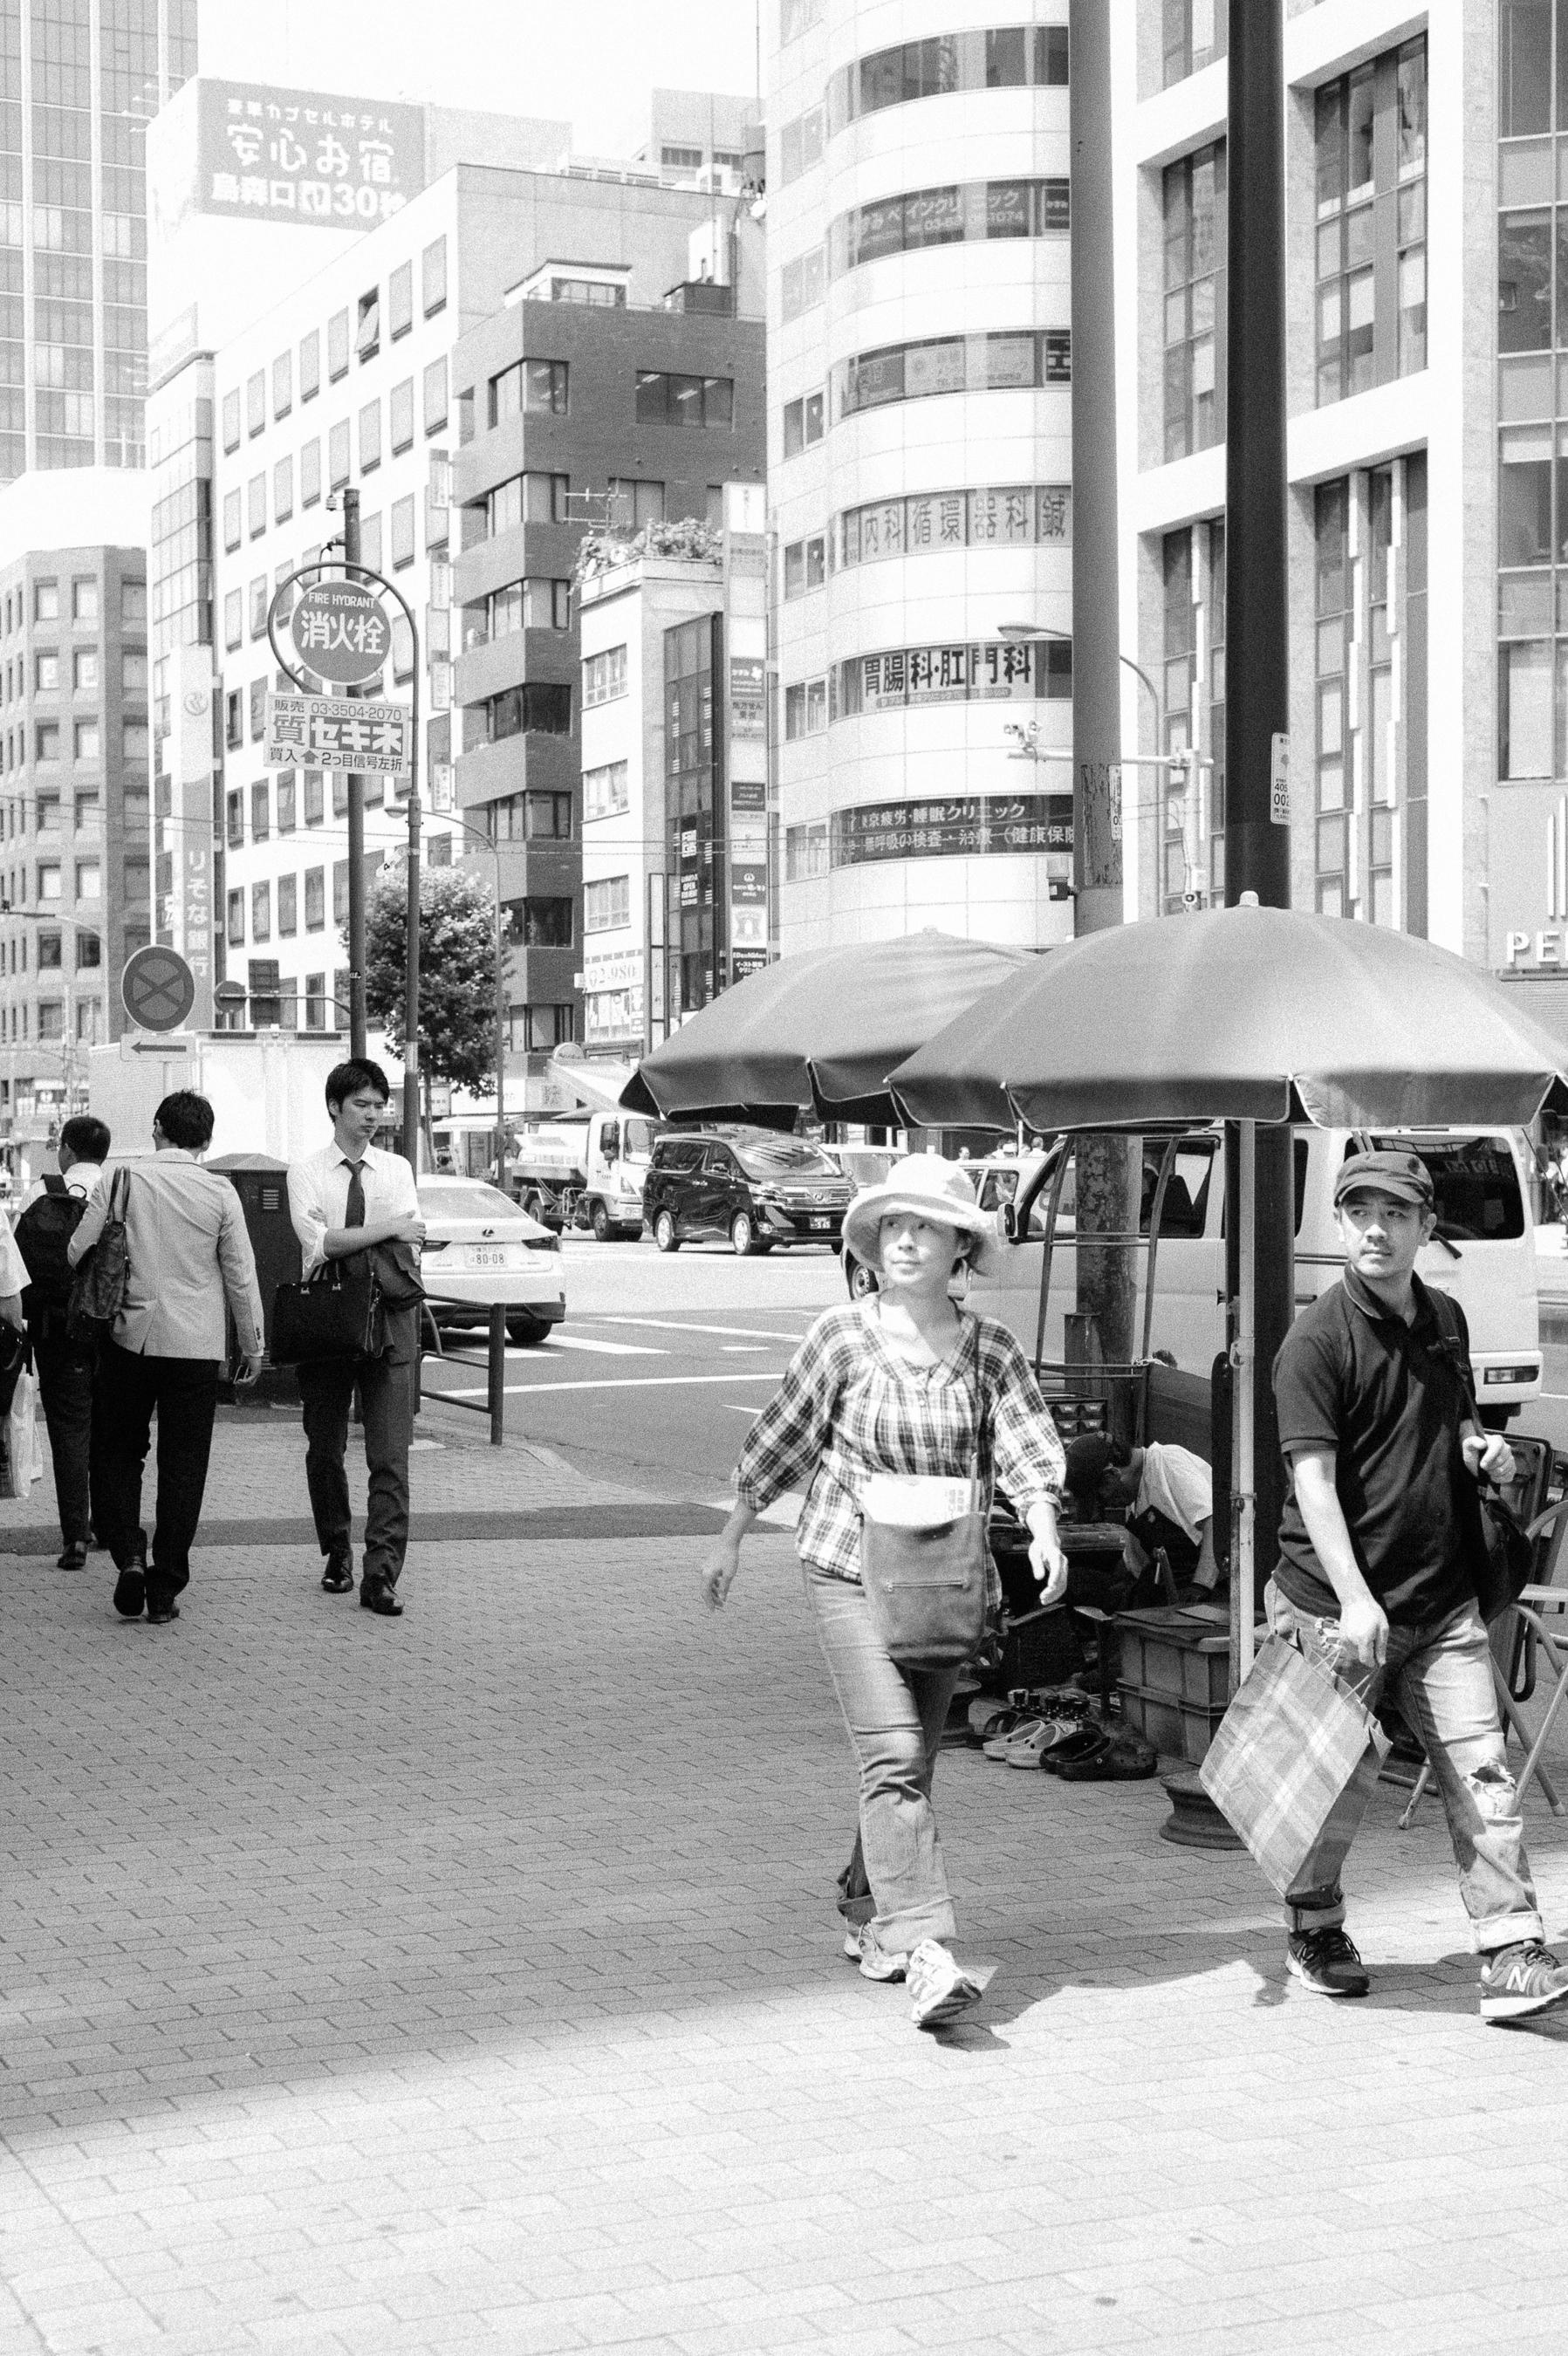 f:id:aoyama-takuro:20180920070503j:plain